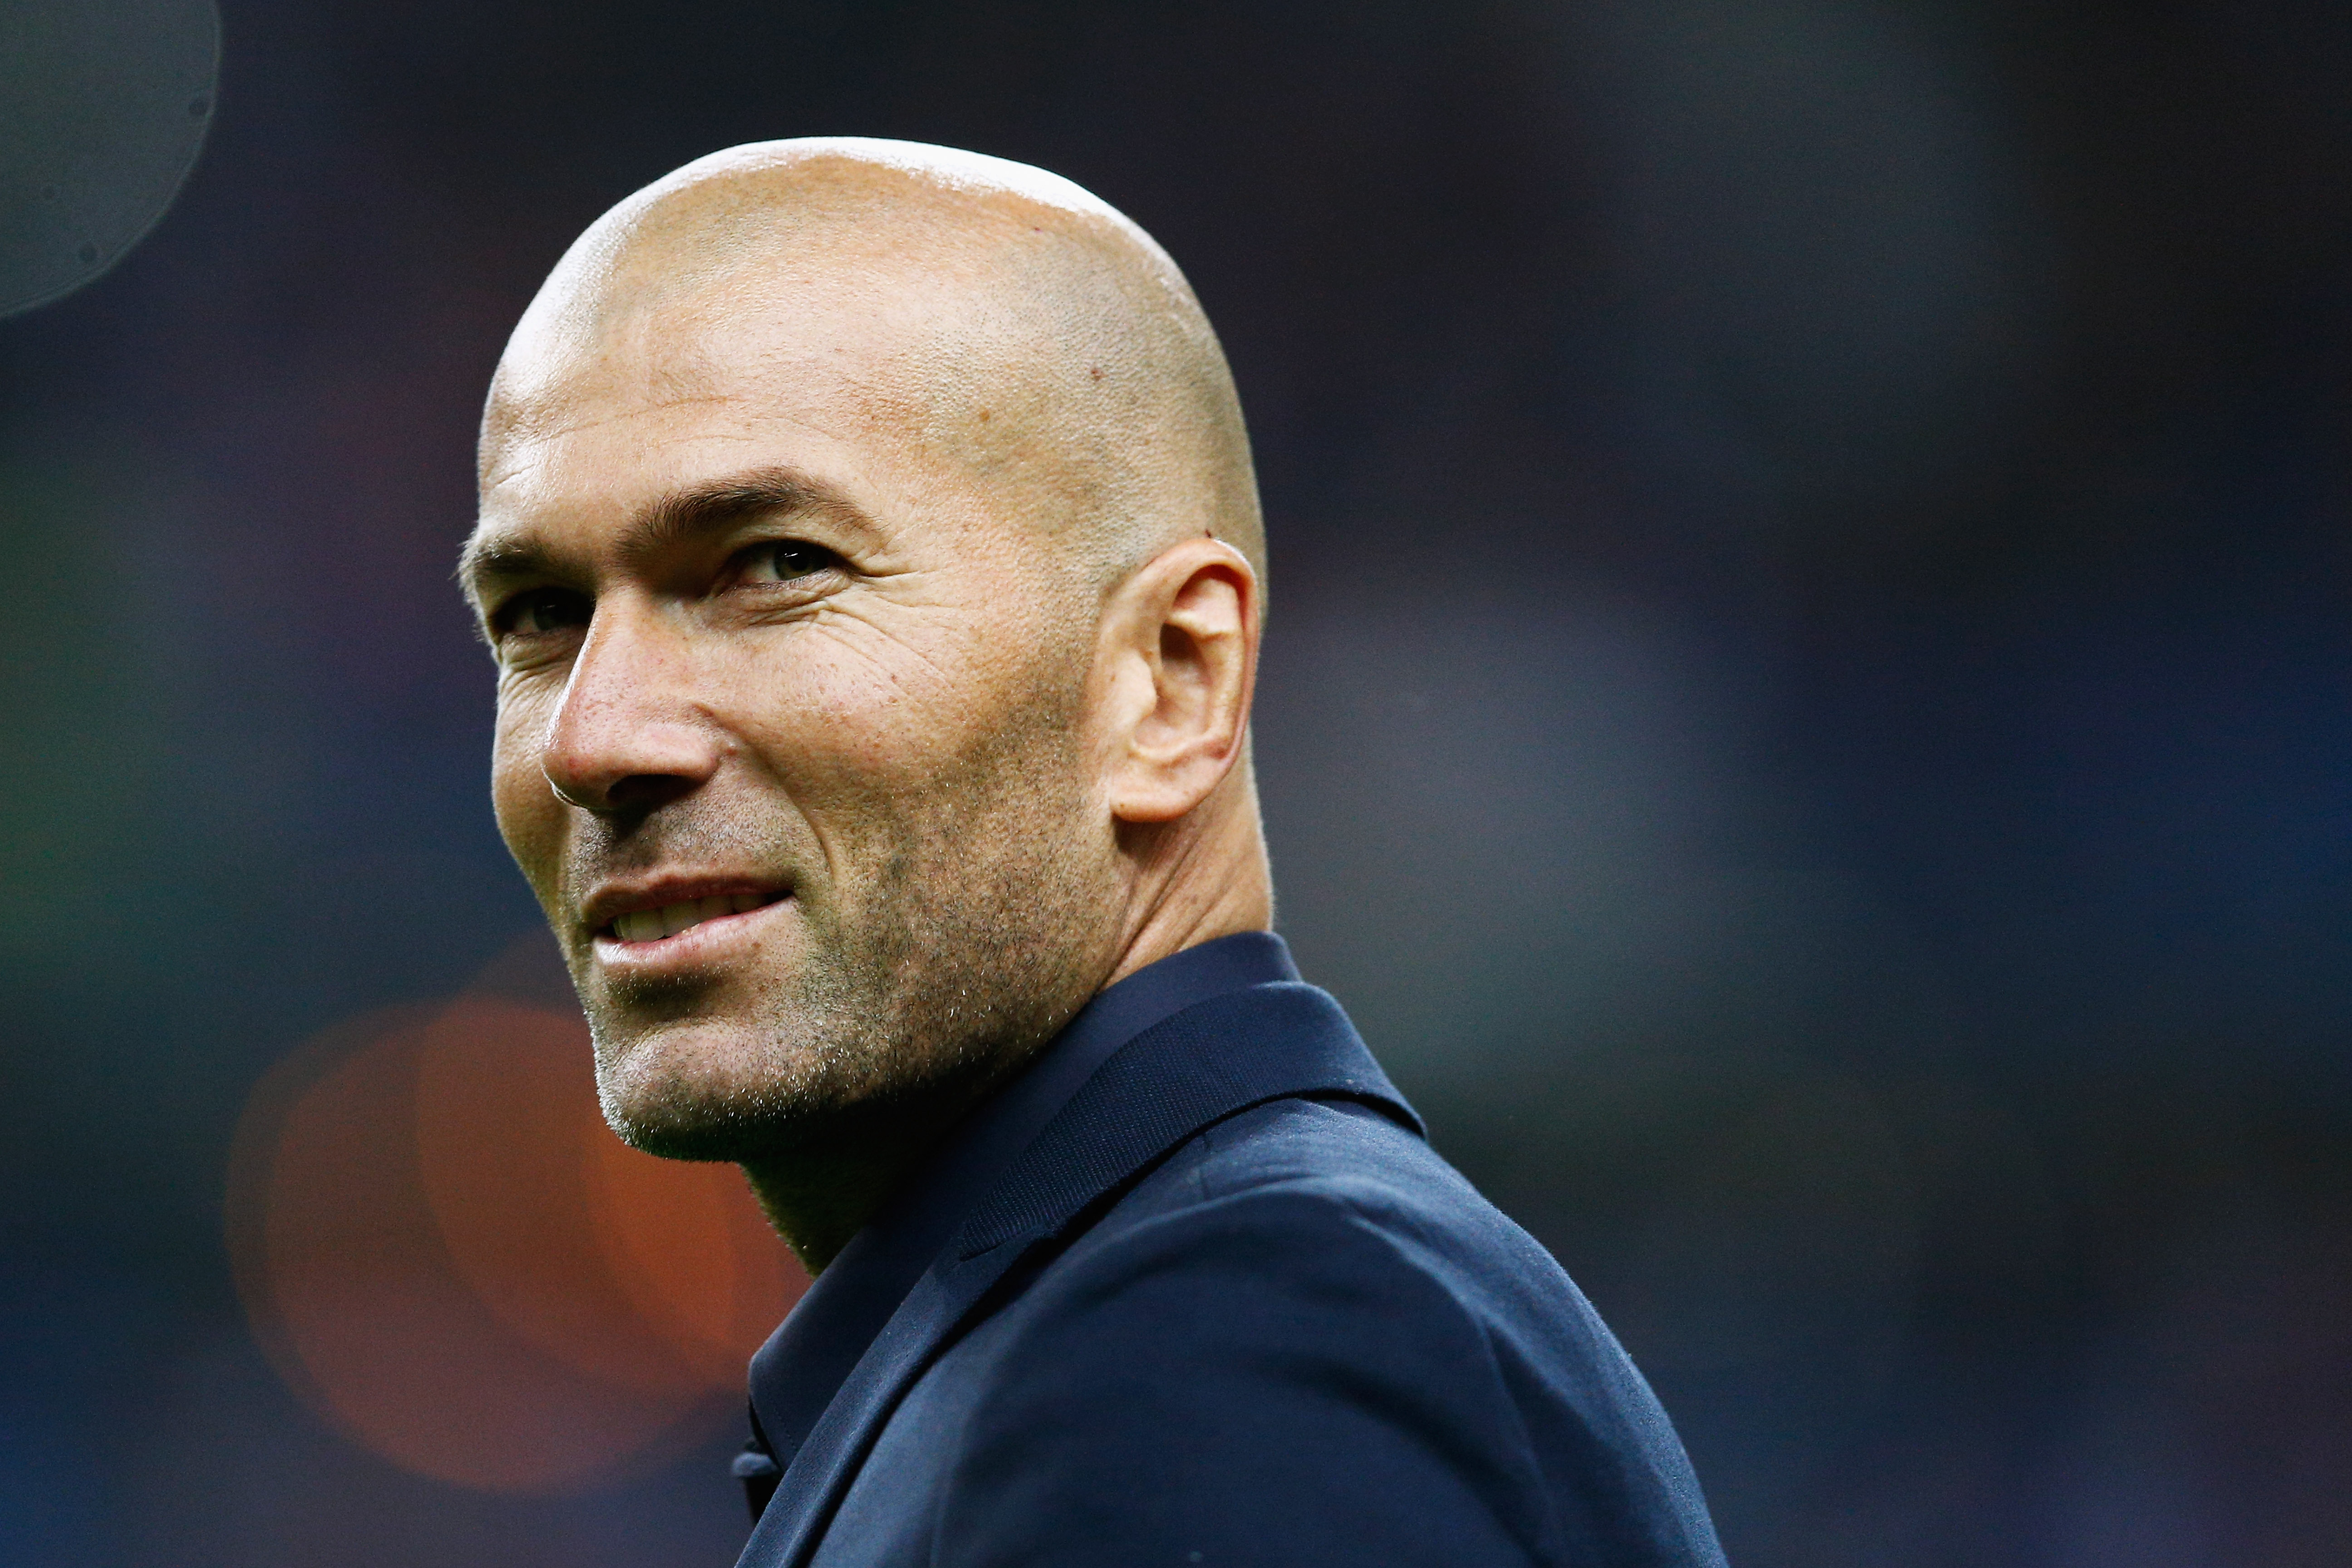 Has Zinedine Zidane Awoken the Stuttering Giant?